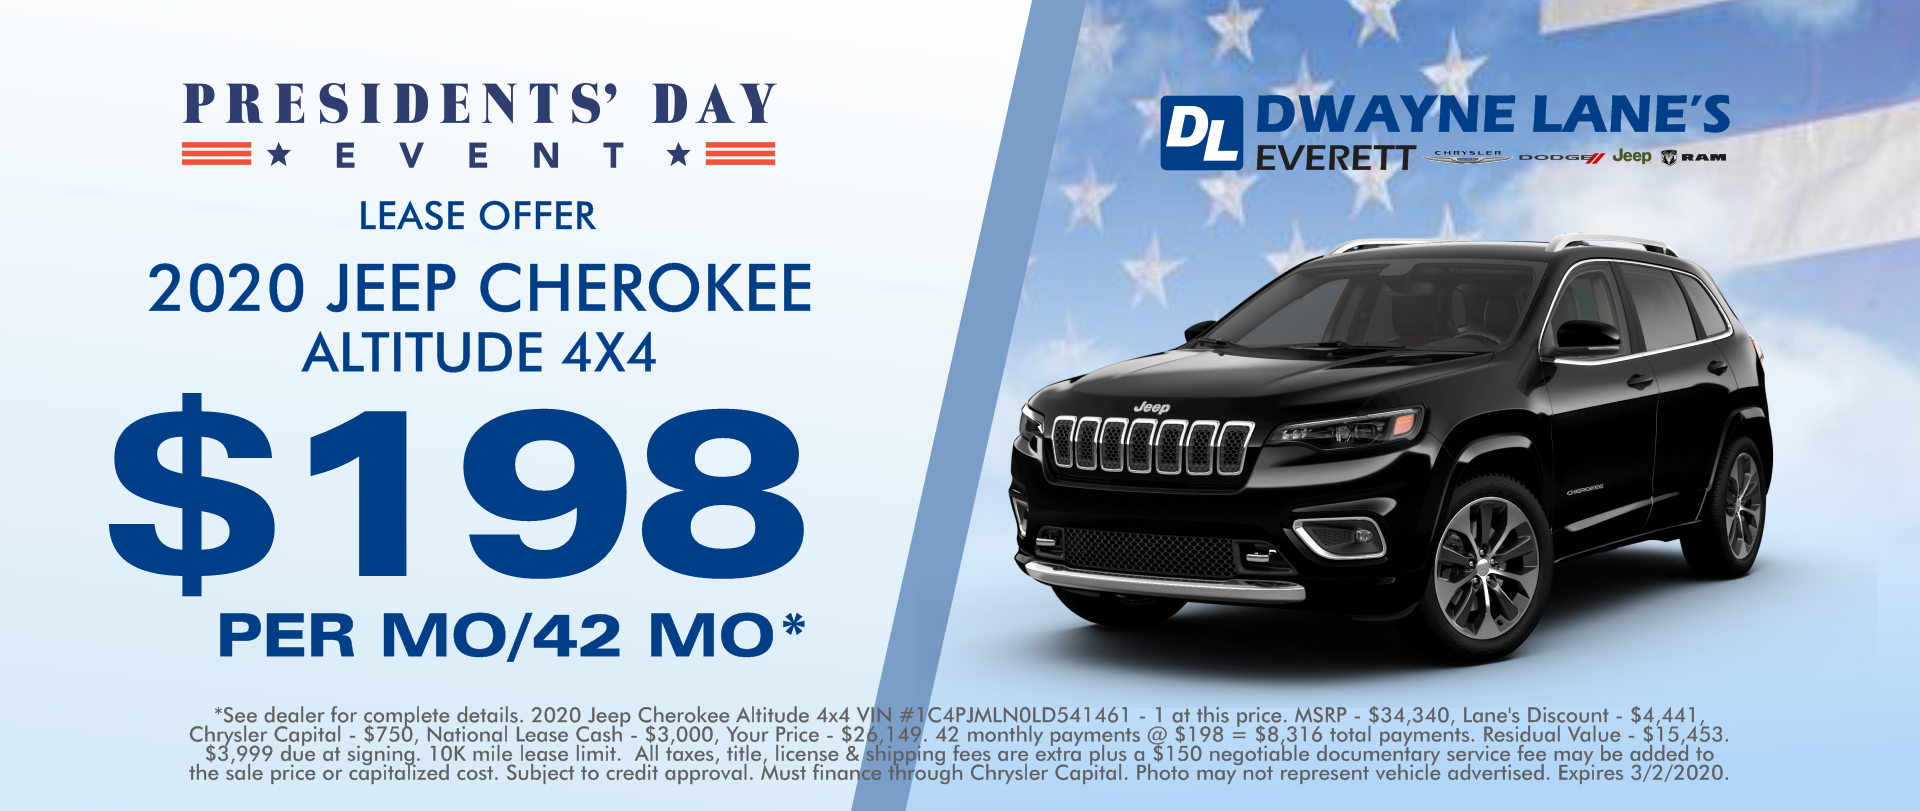 Dwayne lane's Everett 2020 Jeep Cherokee $198 per month